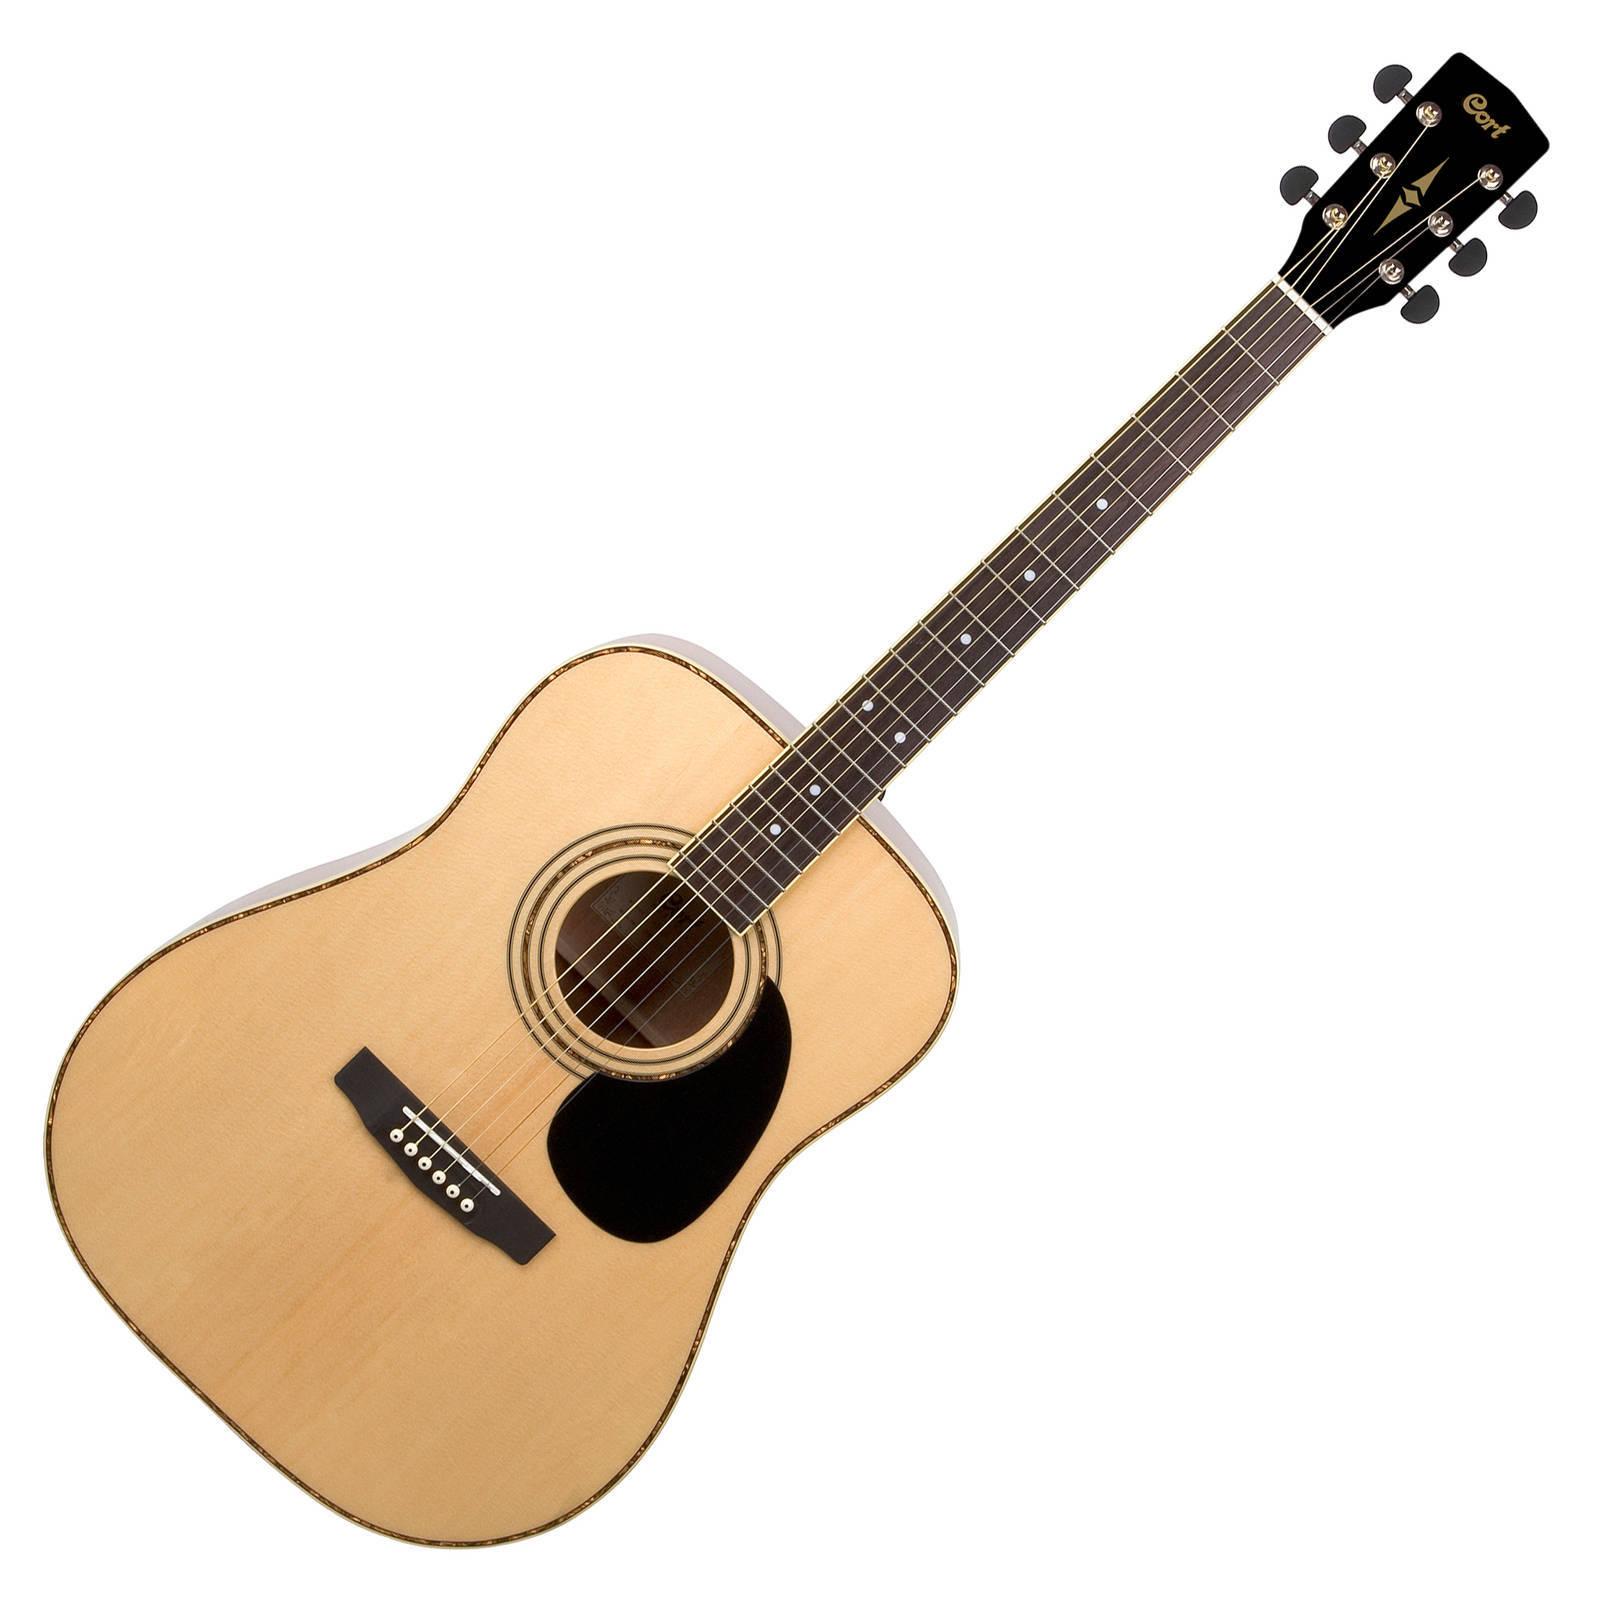 Cort AD880 Acoustic Guitar Natural Satin